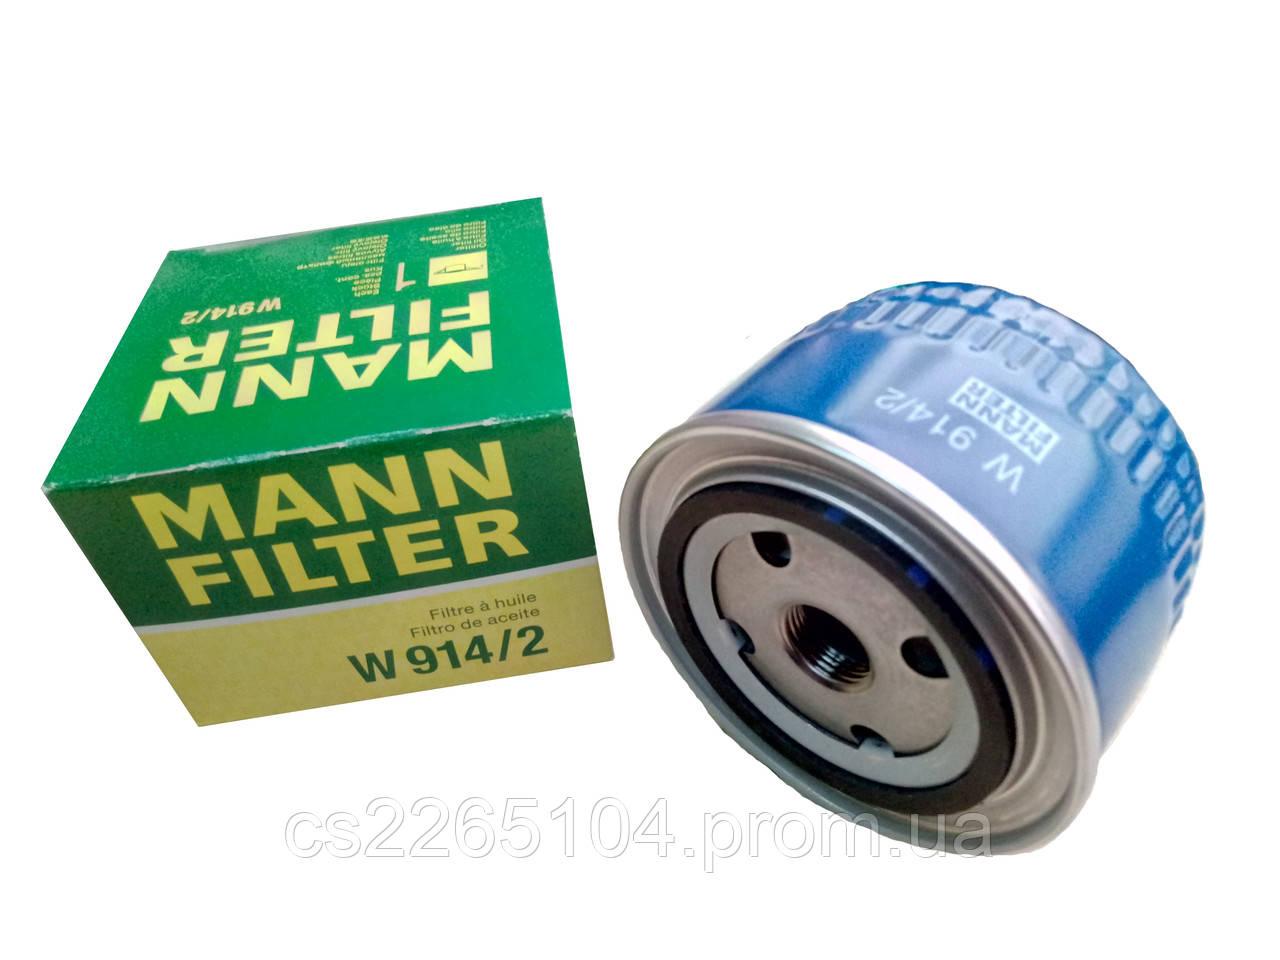 Фильтр масляный ВАЗ 2108-2115 MANN (Оригинал)